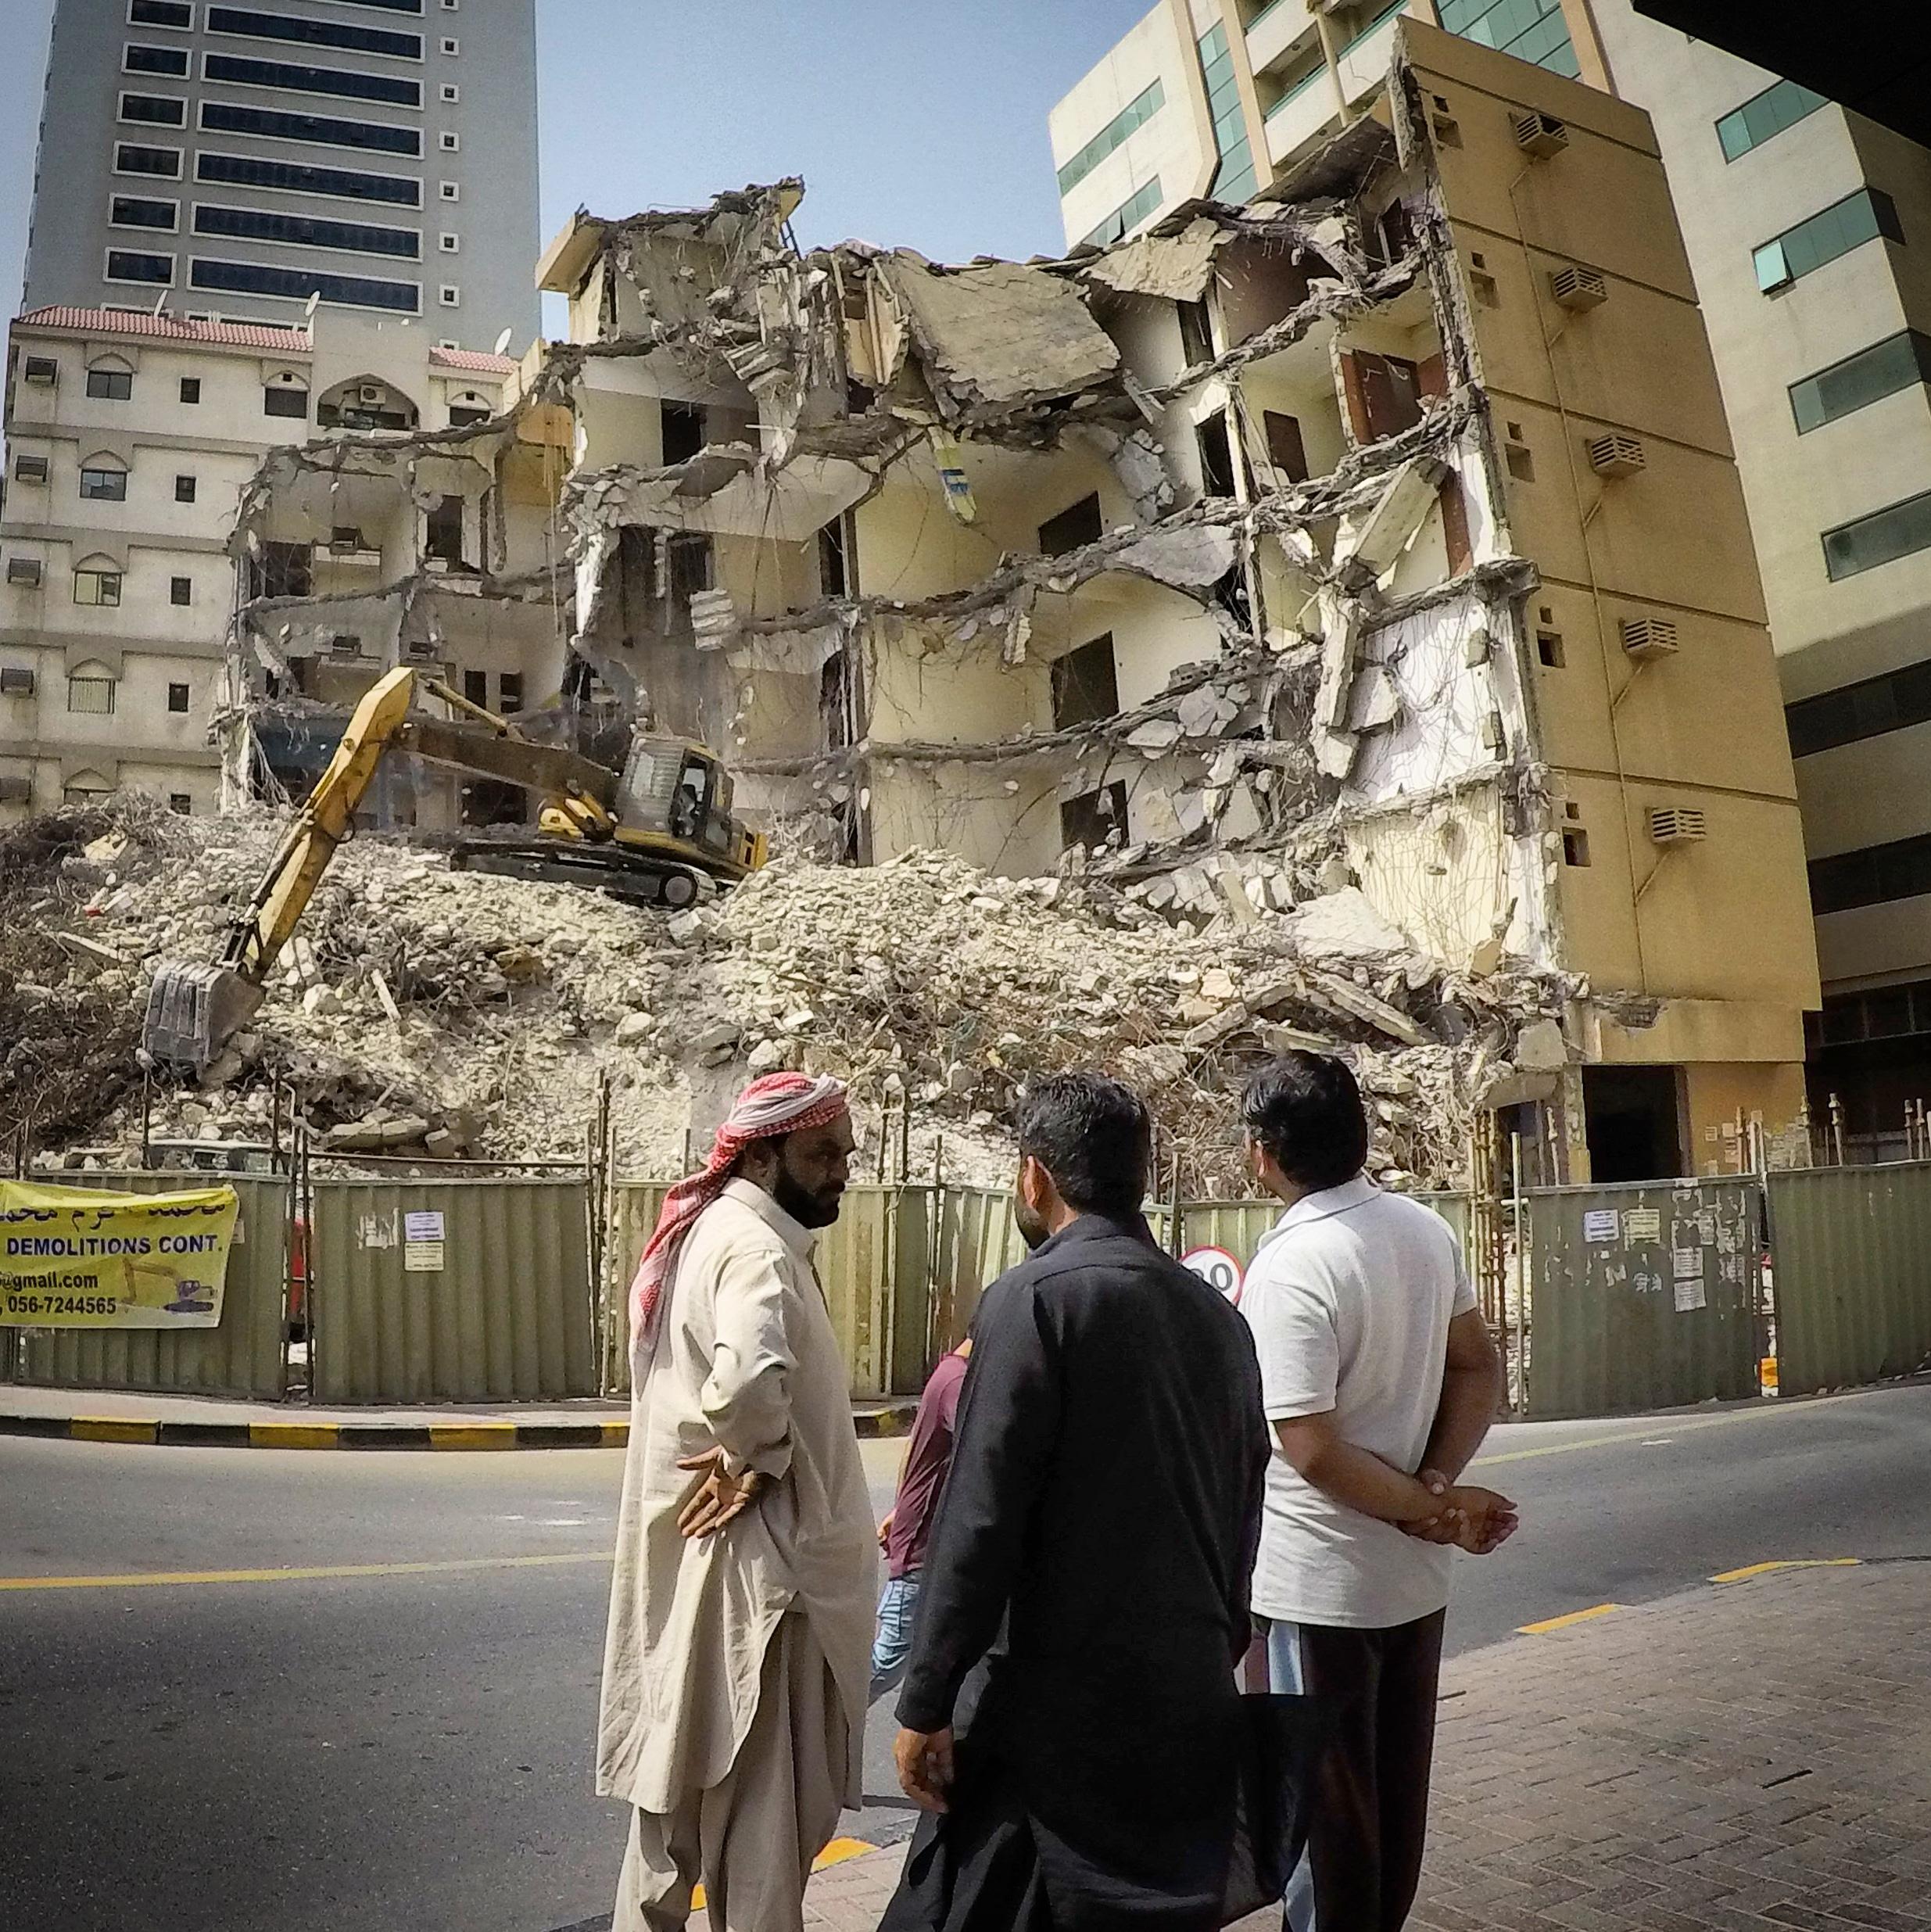 Men watching demolition of a building, Sharjah - United Arab Emirates